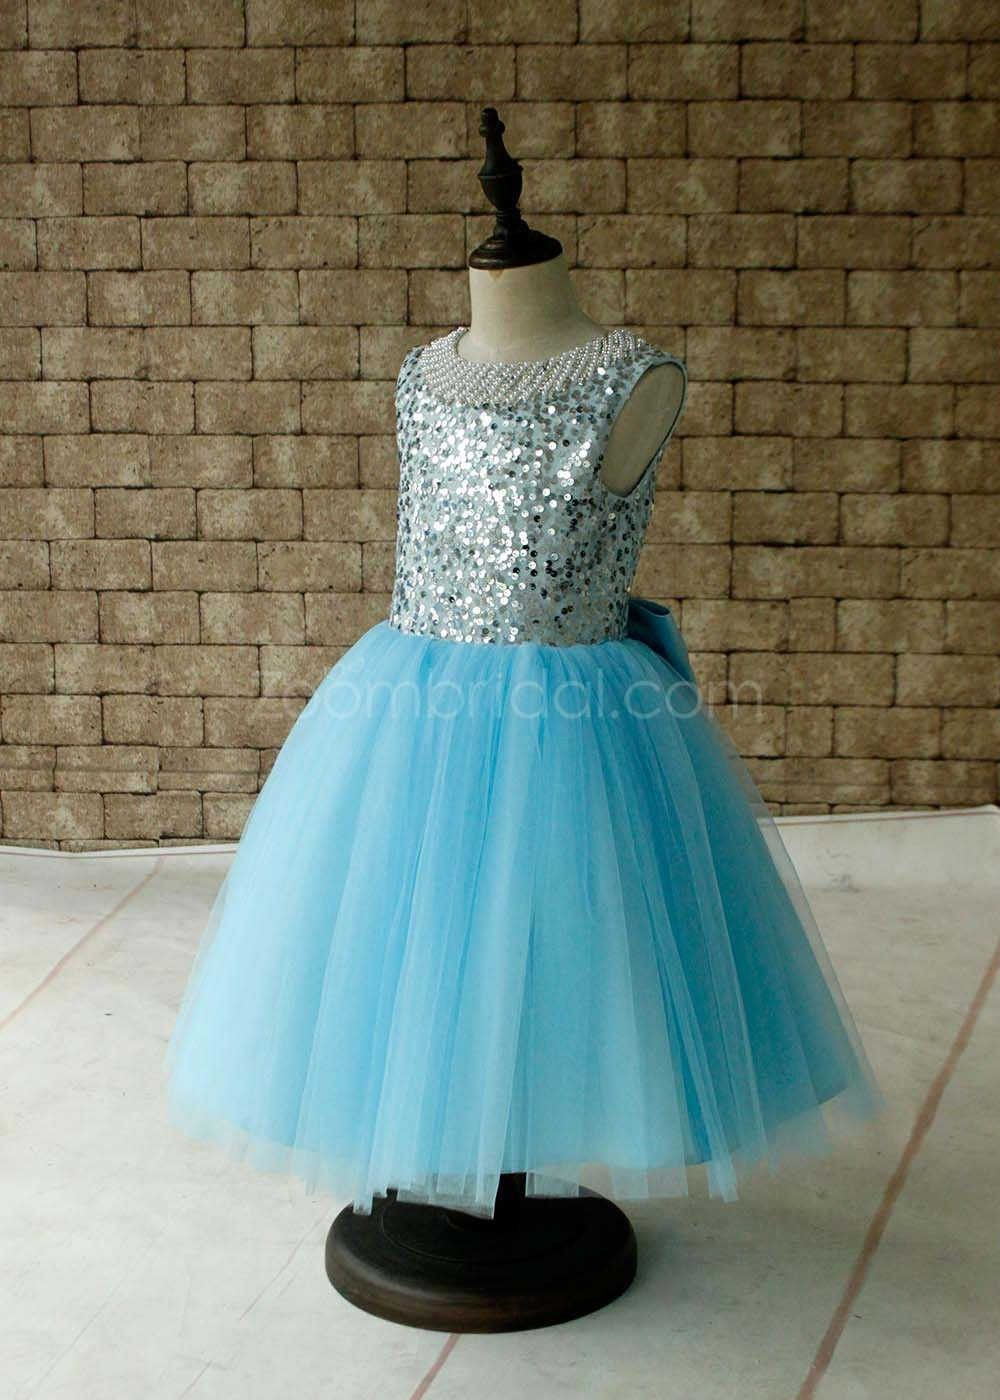 25b289afff525 Light Blue Tutu Sequined Flower Girls Dress Keyhole Back with Bow ...